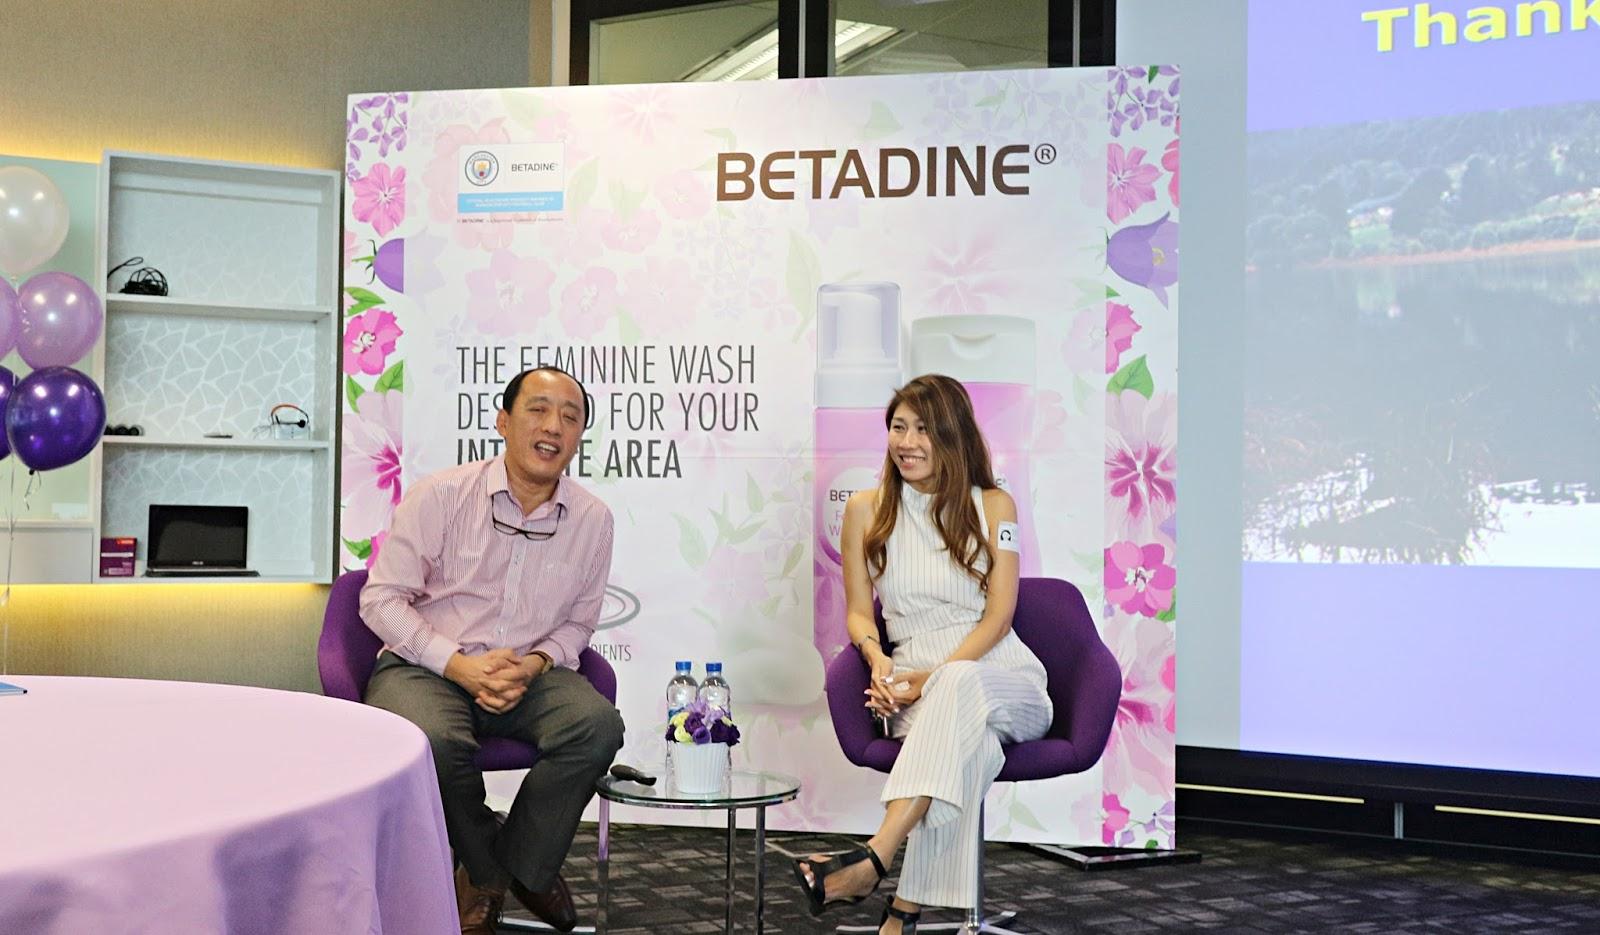 BETADINE® Feminine Wash Event - aggylow